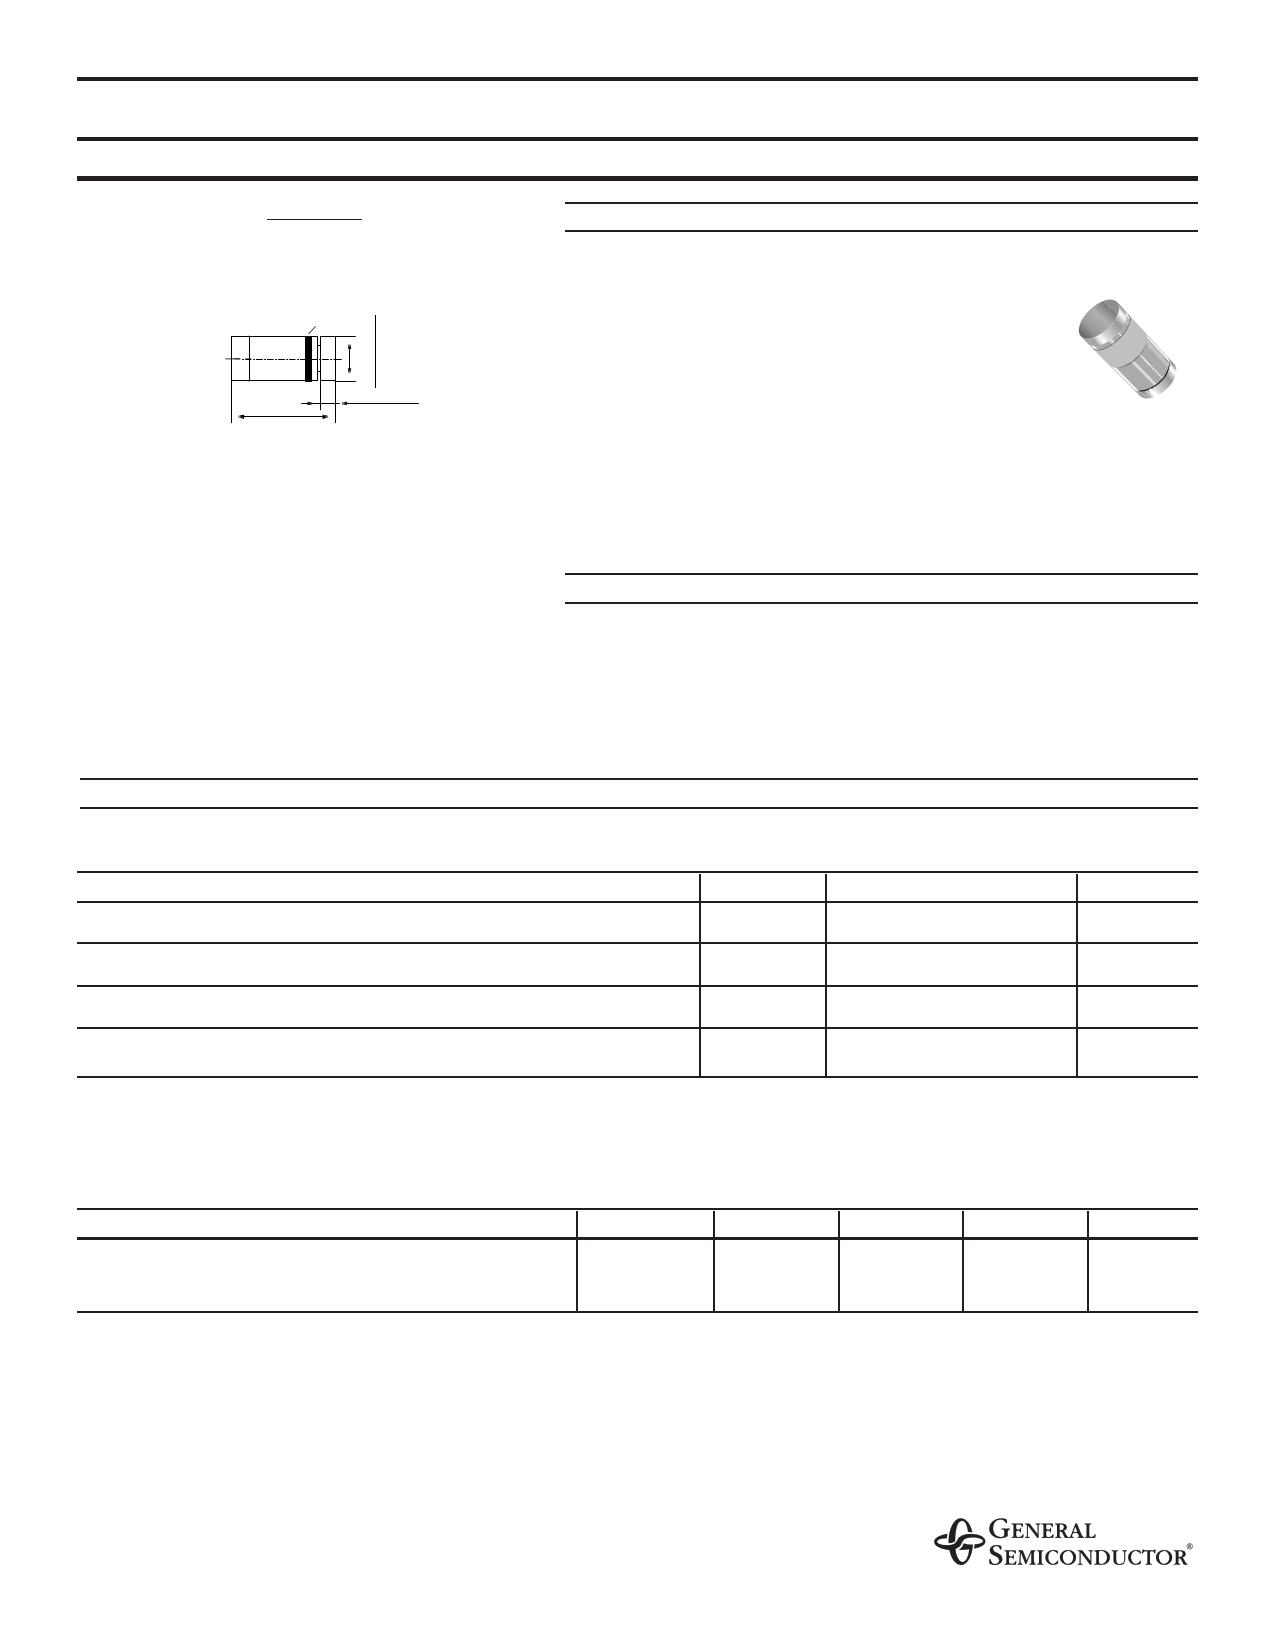 ZMM4.7 datasheet